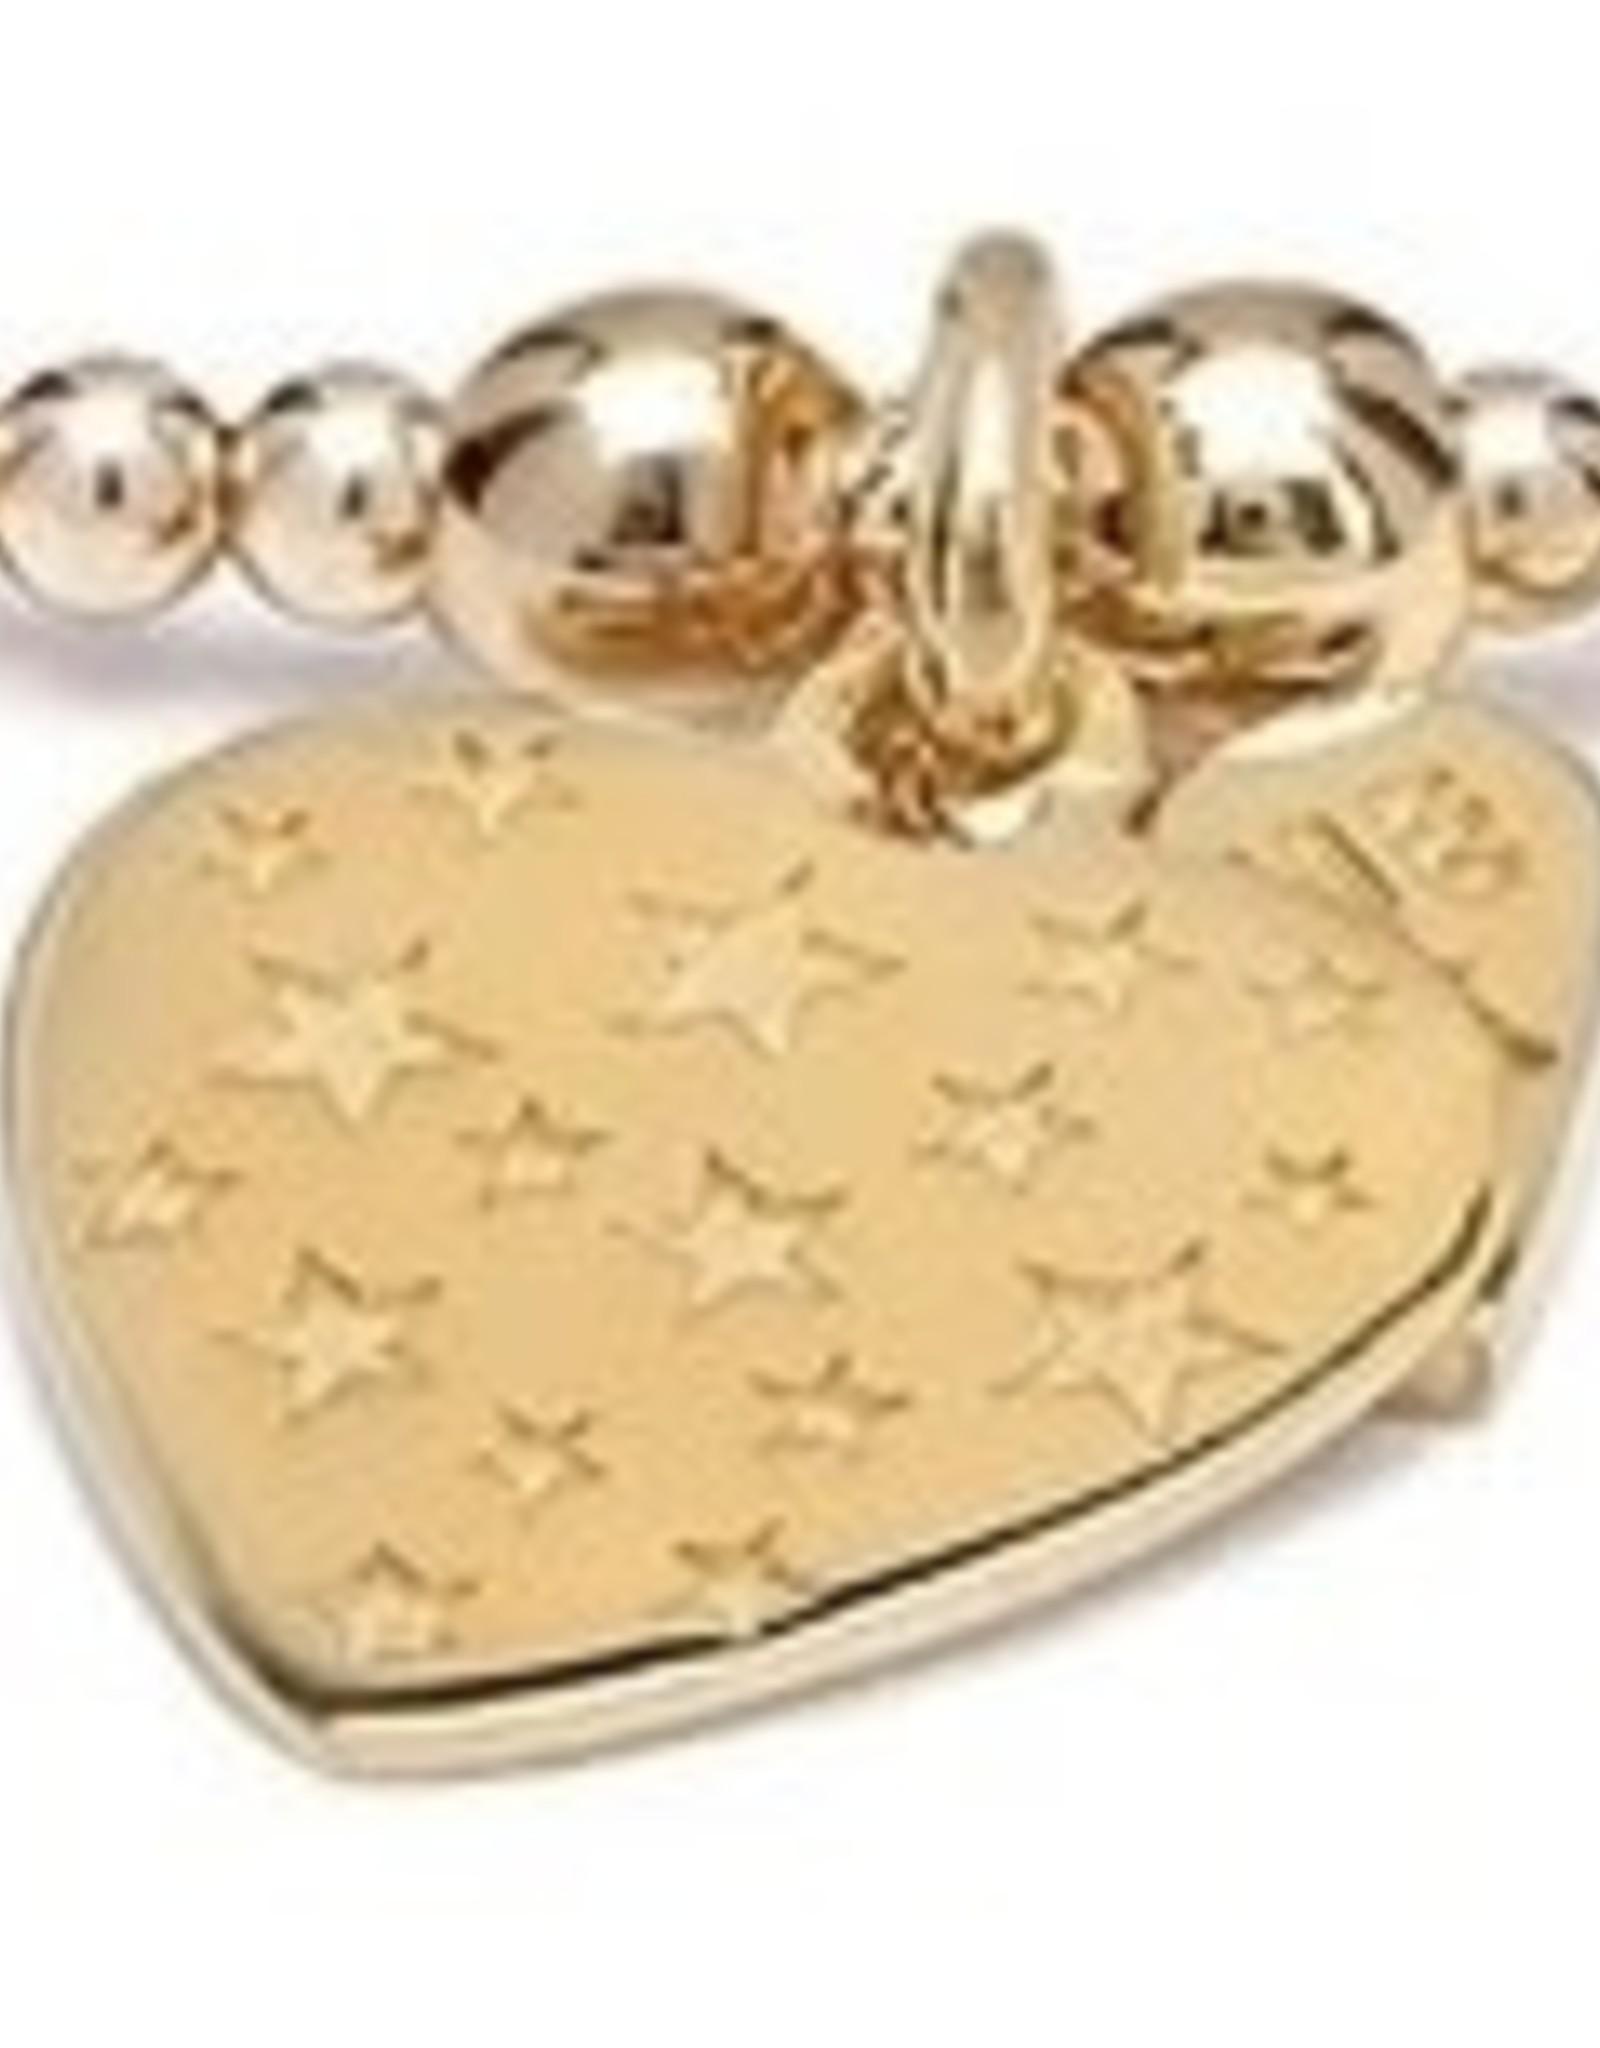 "SANTEENIE GOLD  ""HEART WITH STARS"" CHARM BRACELET  FROM ANNIE HAAK"